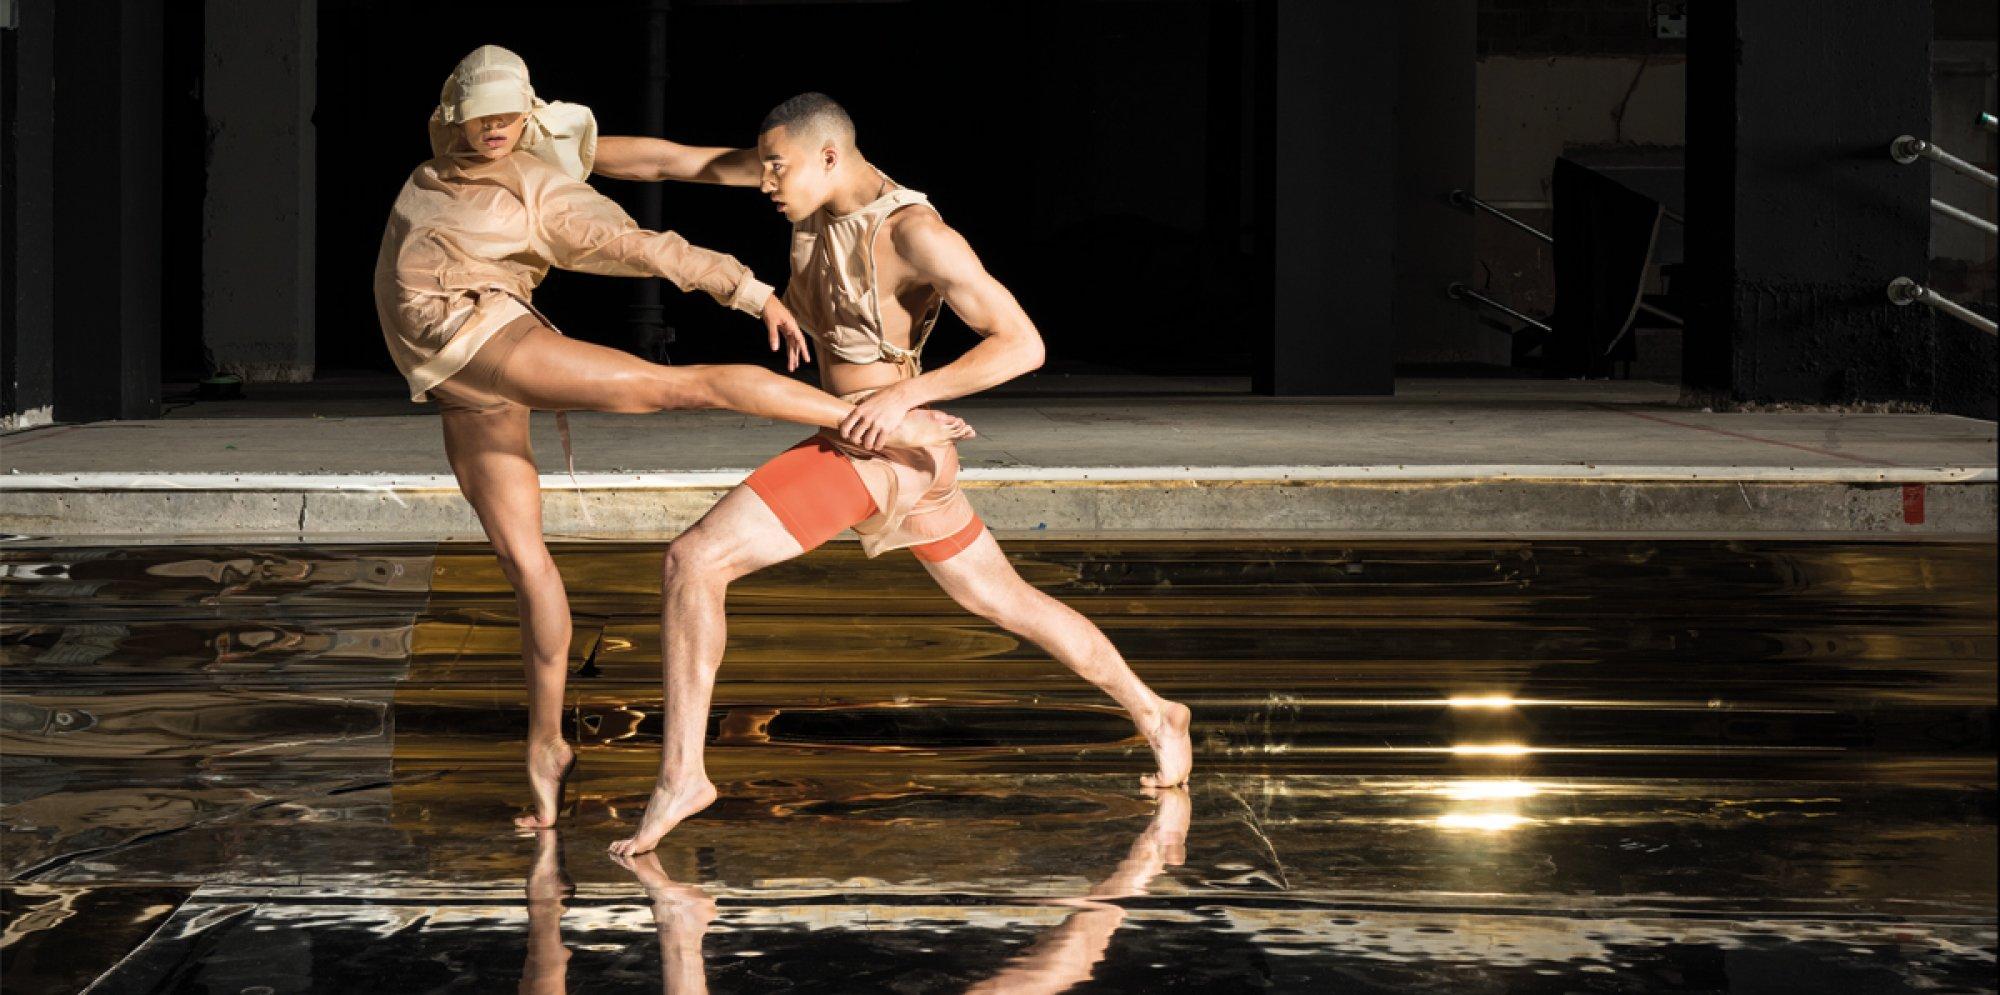 Rambert Dance Rambert2 two young dancers in nude clothing dancing in an empty space